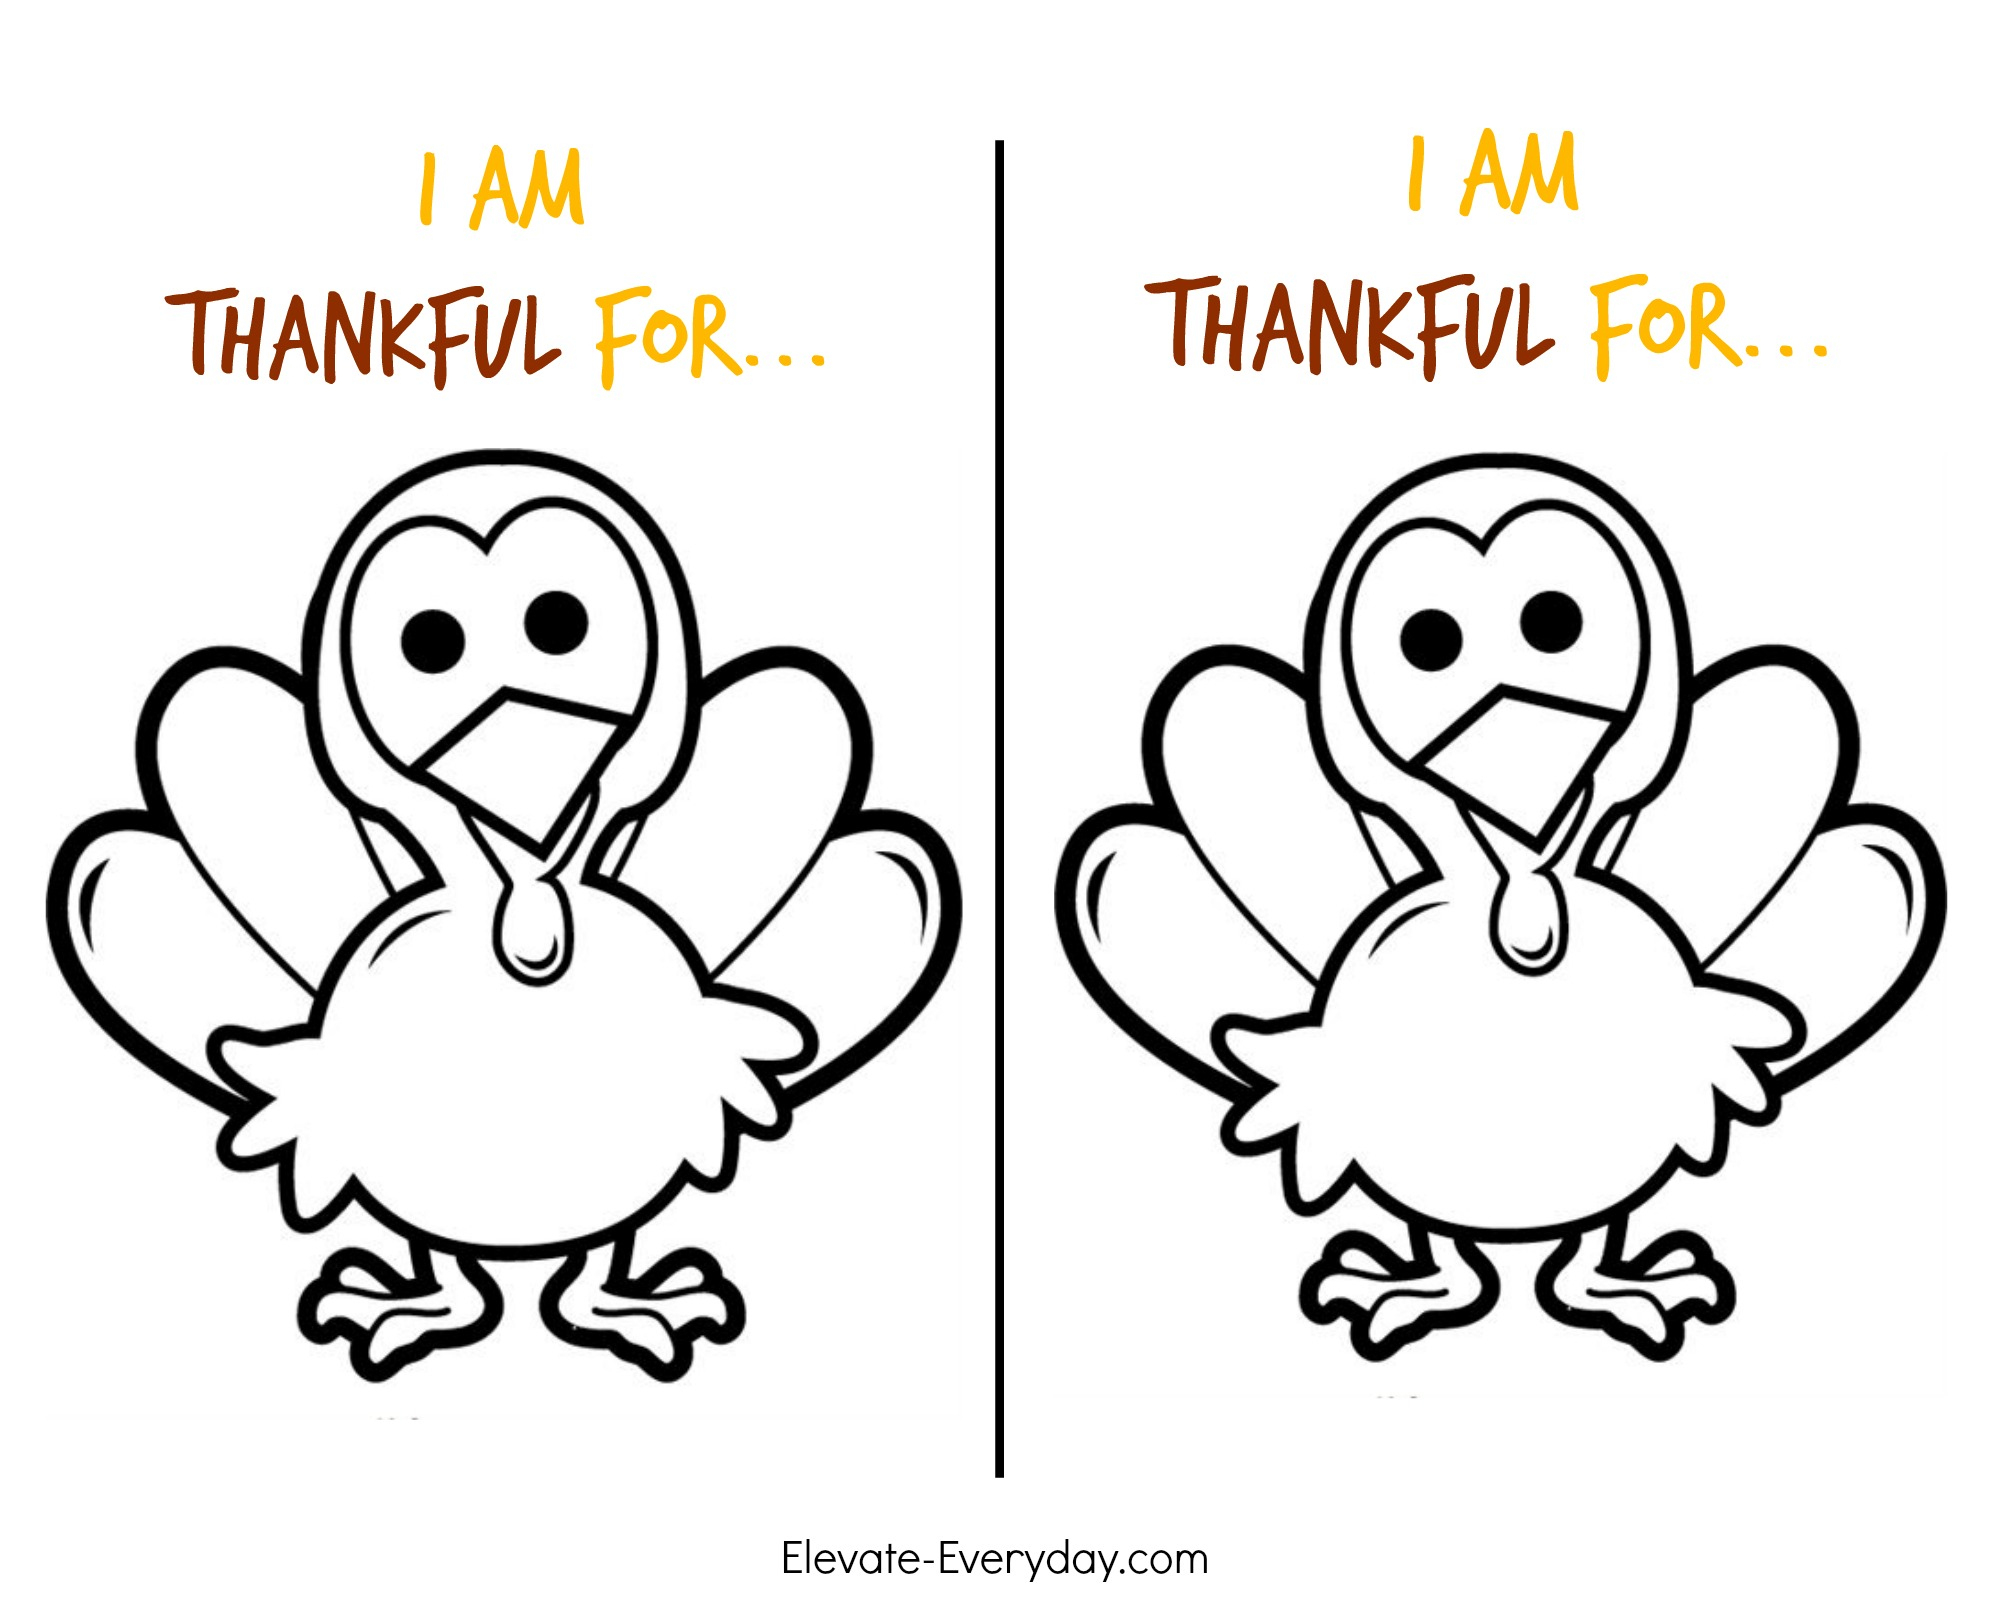 Thankful Turkey Craft + Free Printable | Pollinate Media Group - Free Printable Turkey Craft